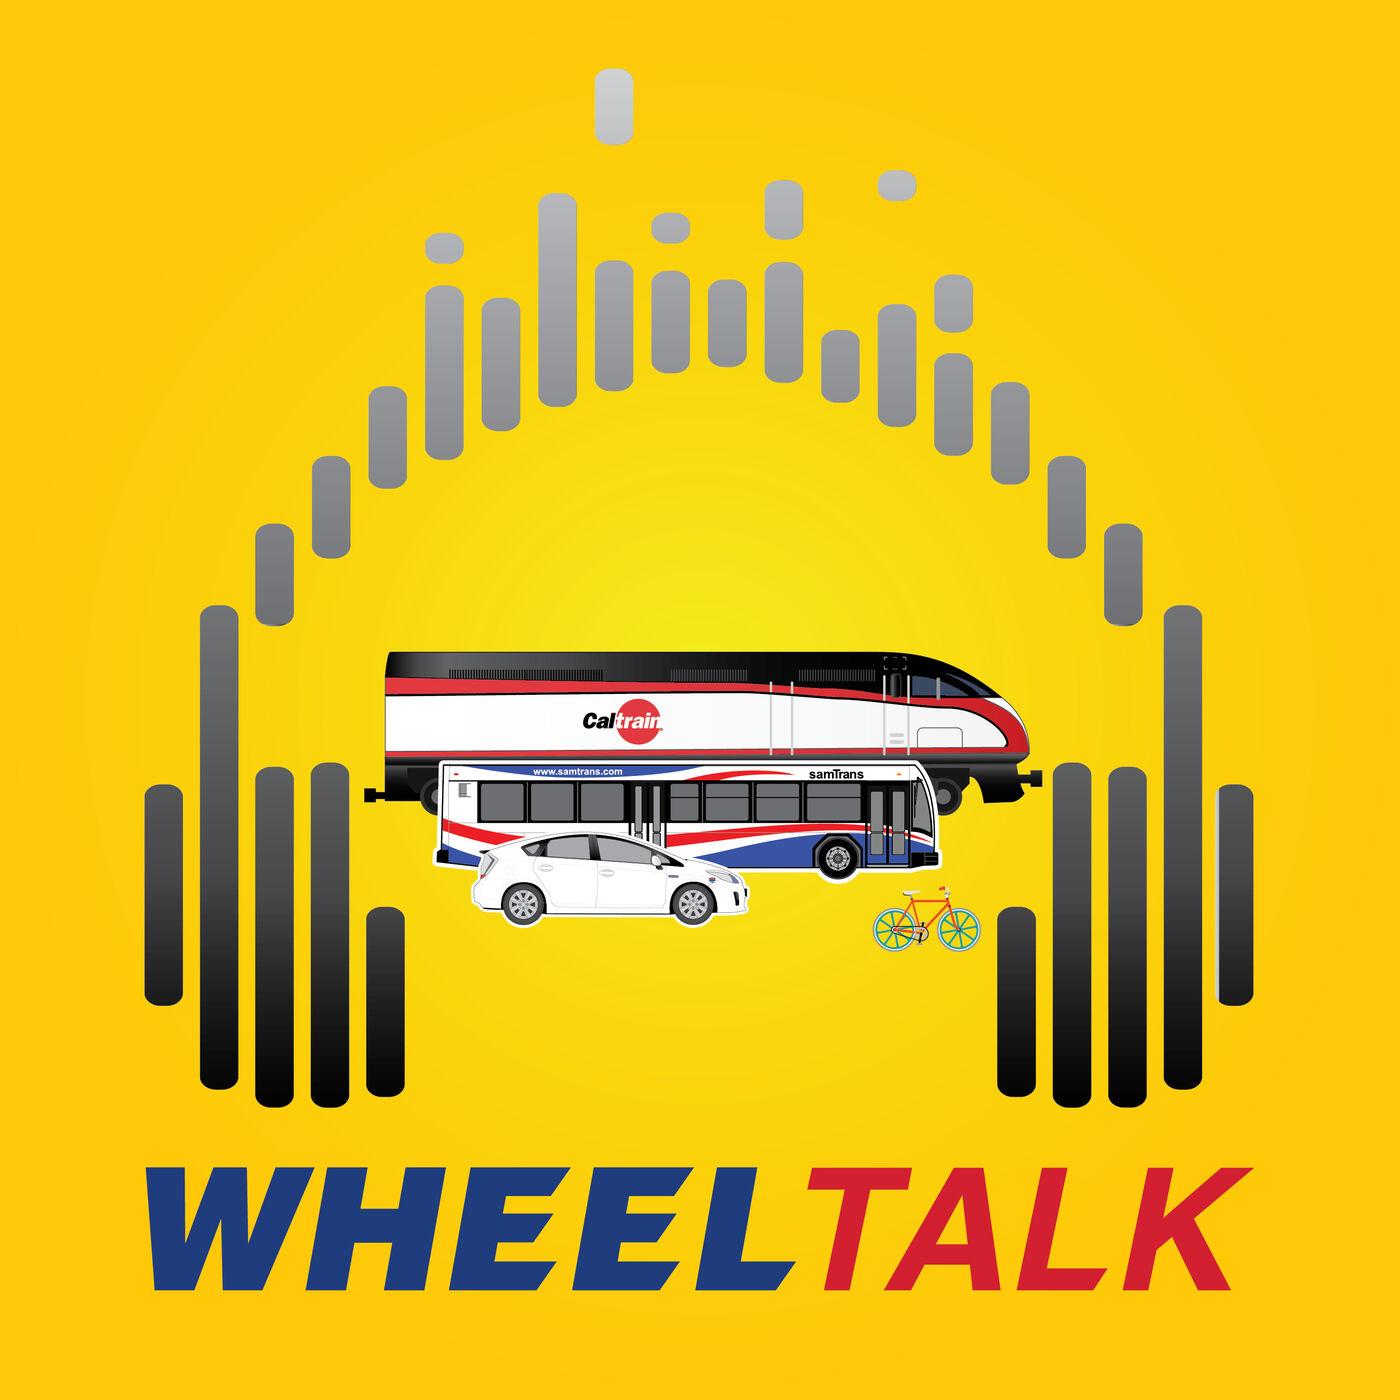 Episode 1: Improving Safety on Caltrain Tracks